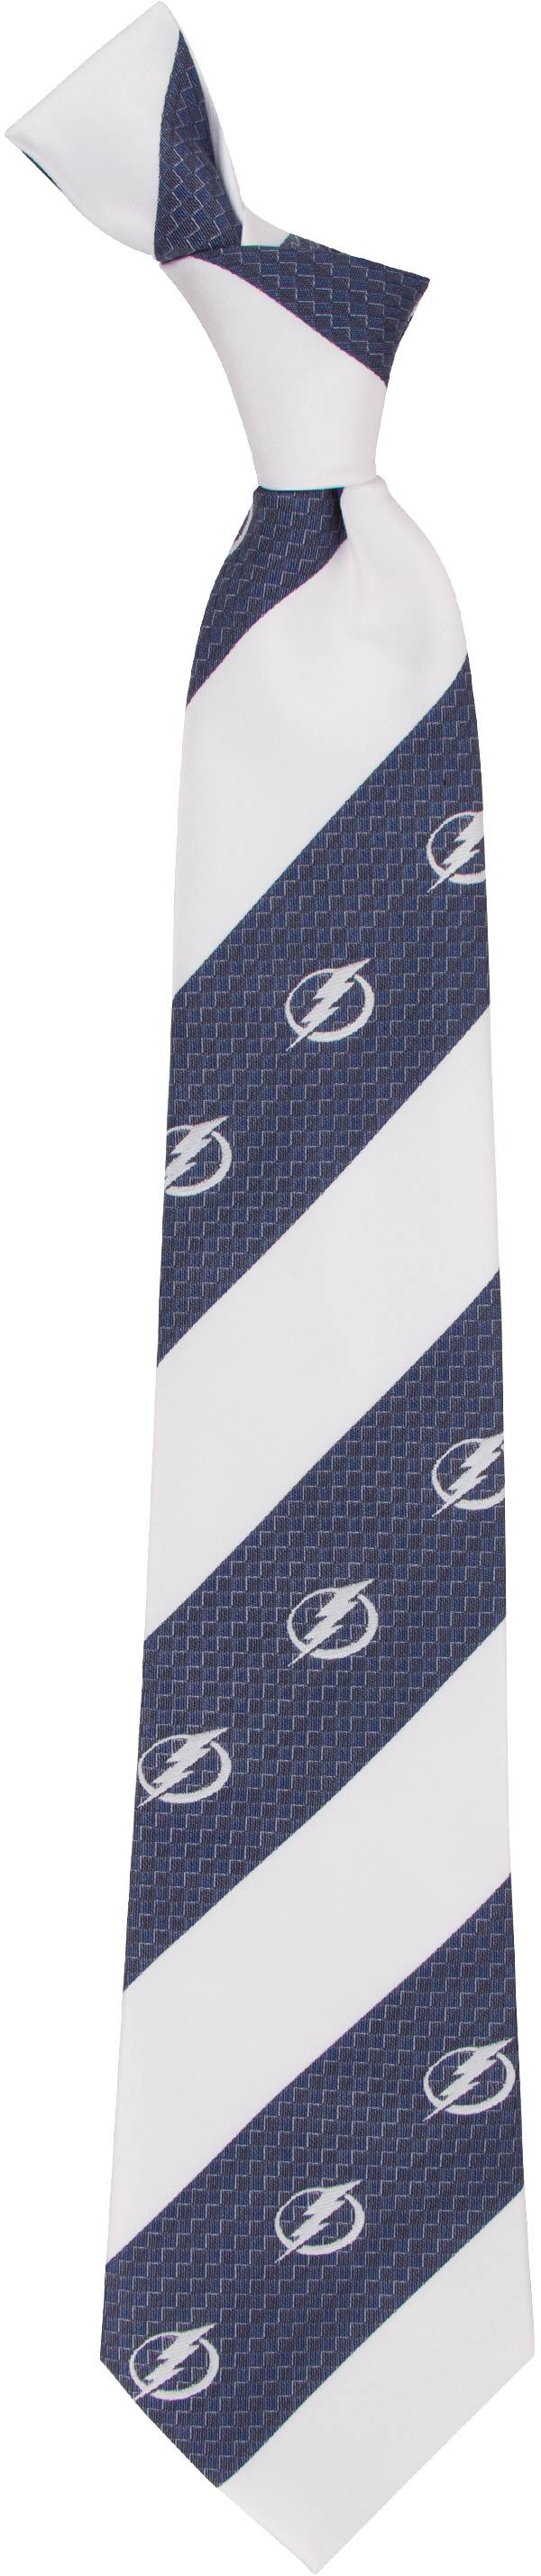 Eagles Wings Tampa Bay Lightning Geo Stripe Necktie product image